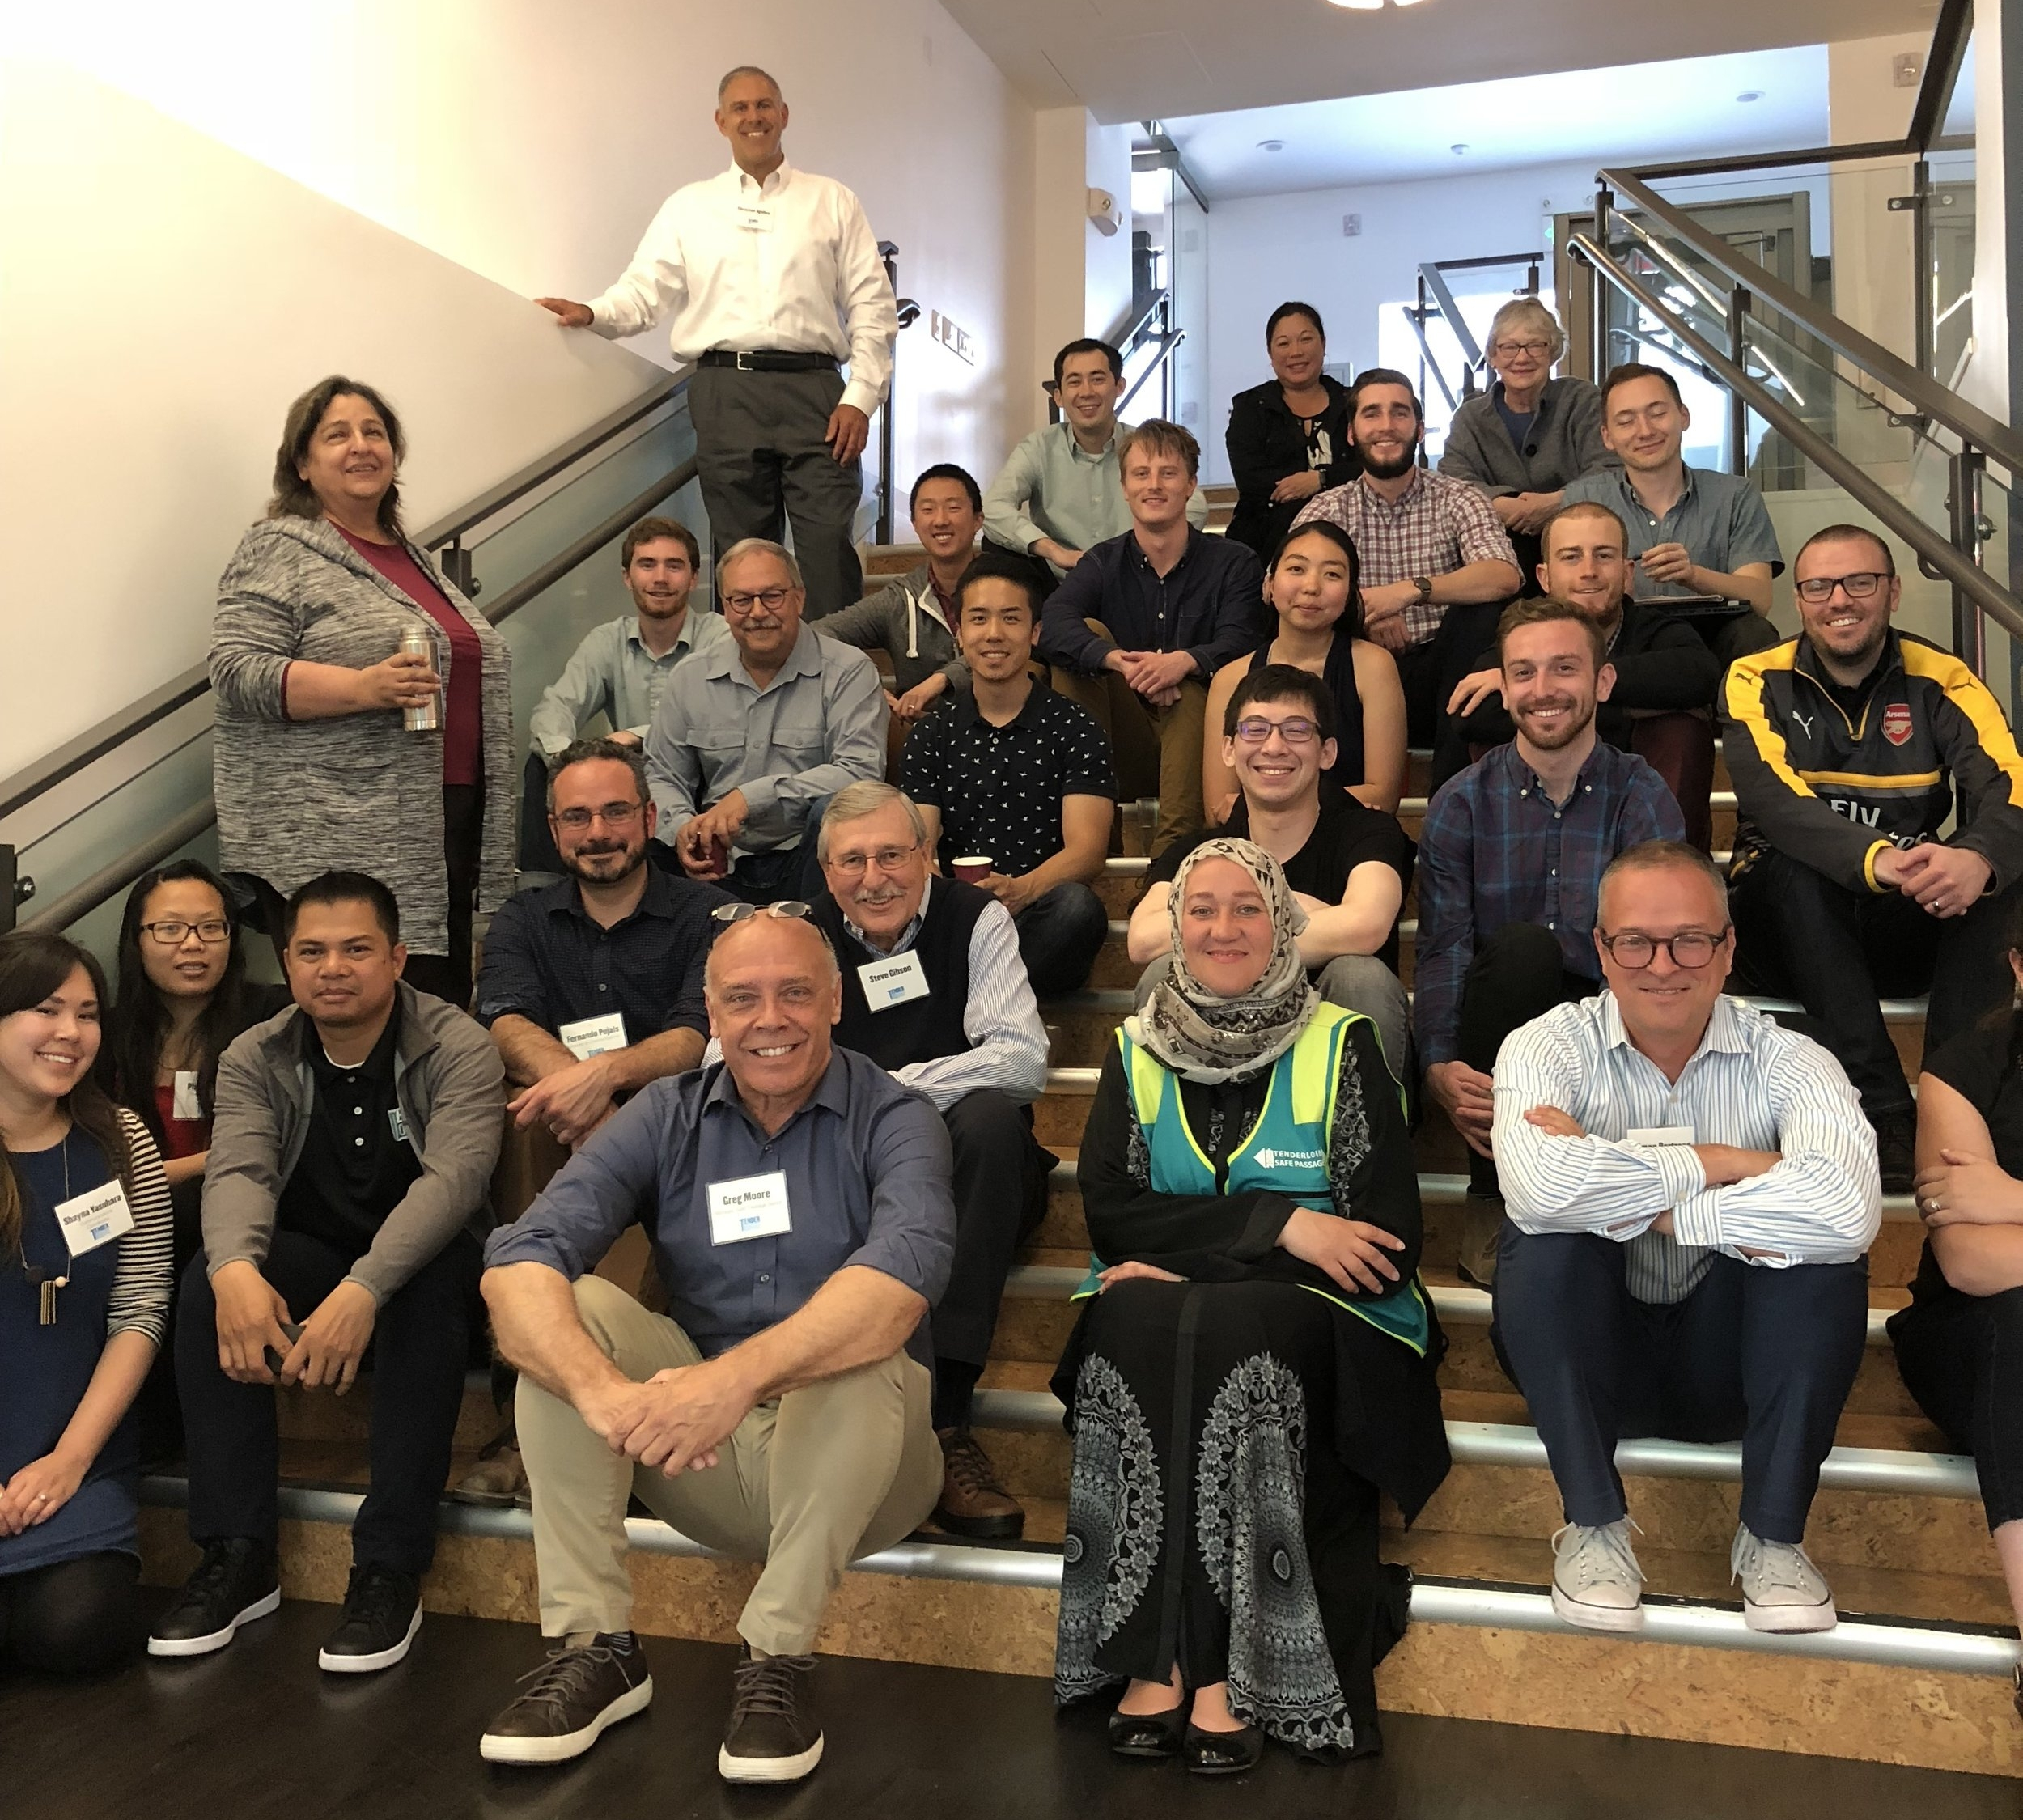 TLCBD and P.A.E. staff at P.A.E. San Francisco offices at 48 Golden Gate Avenue in the Tenderloin.